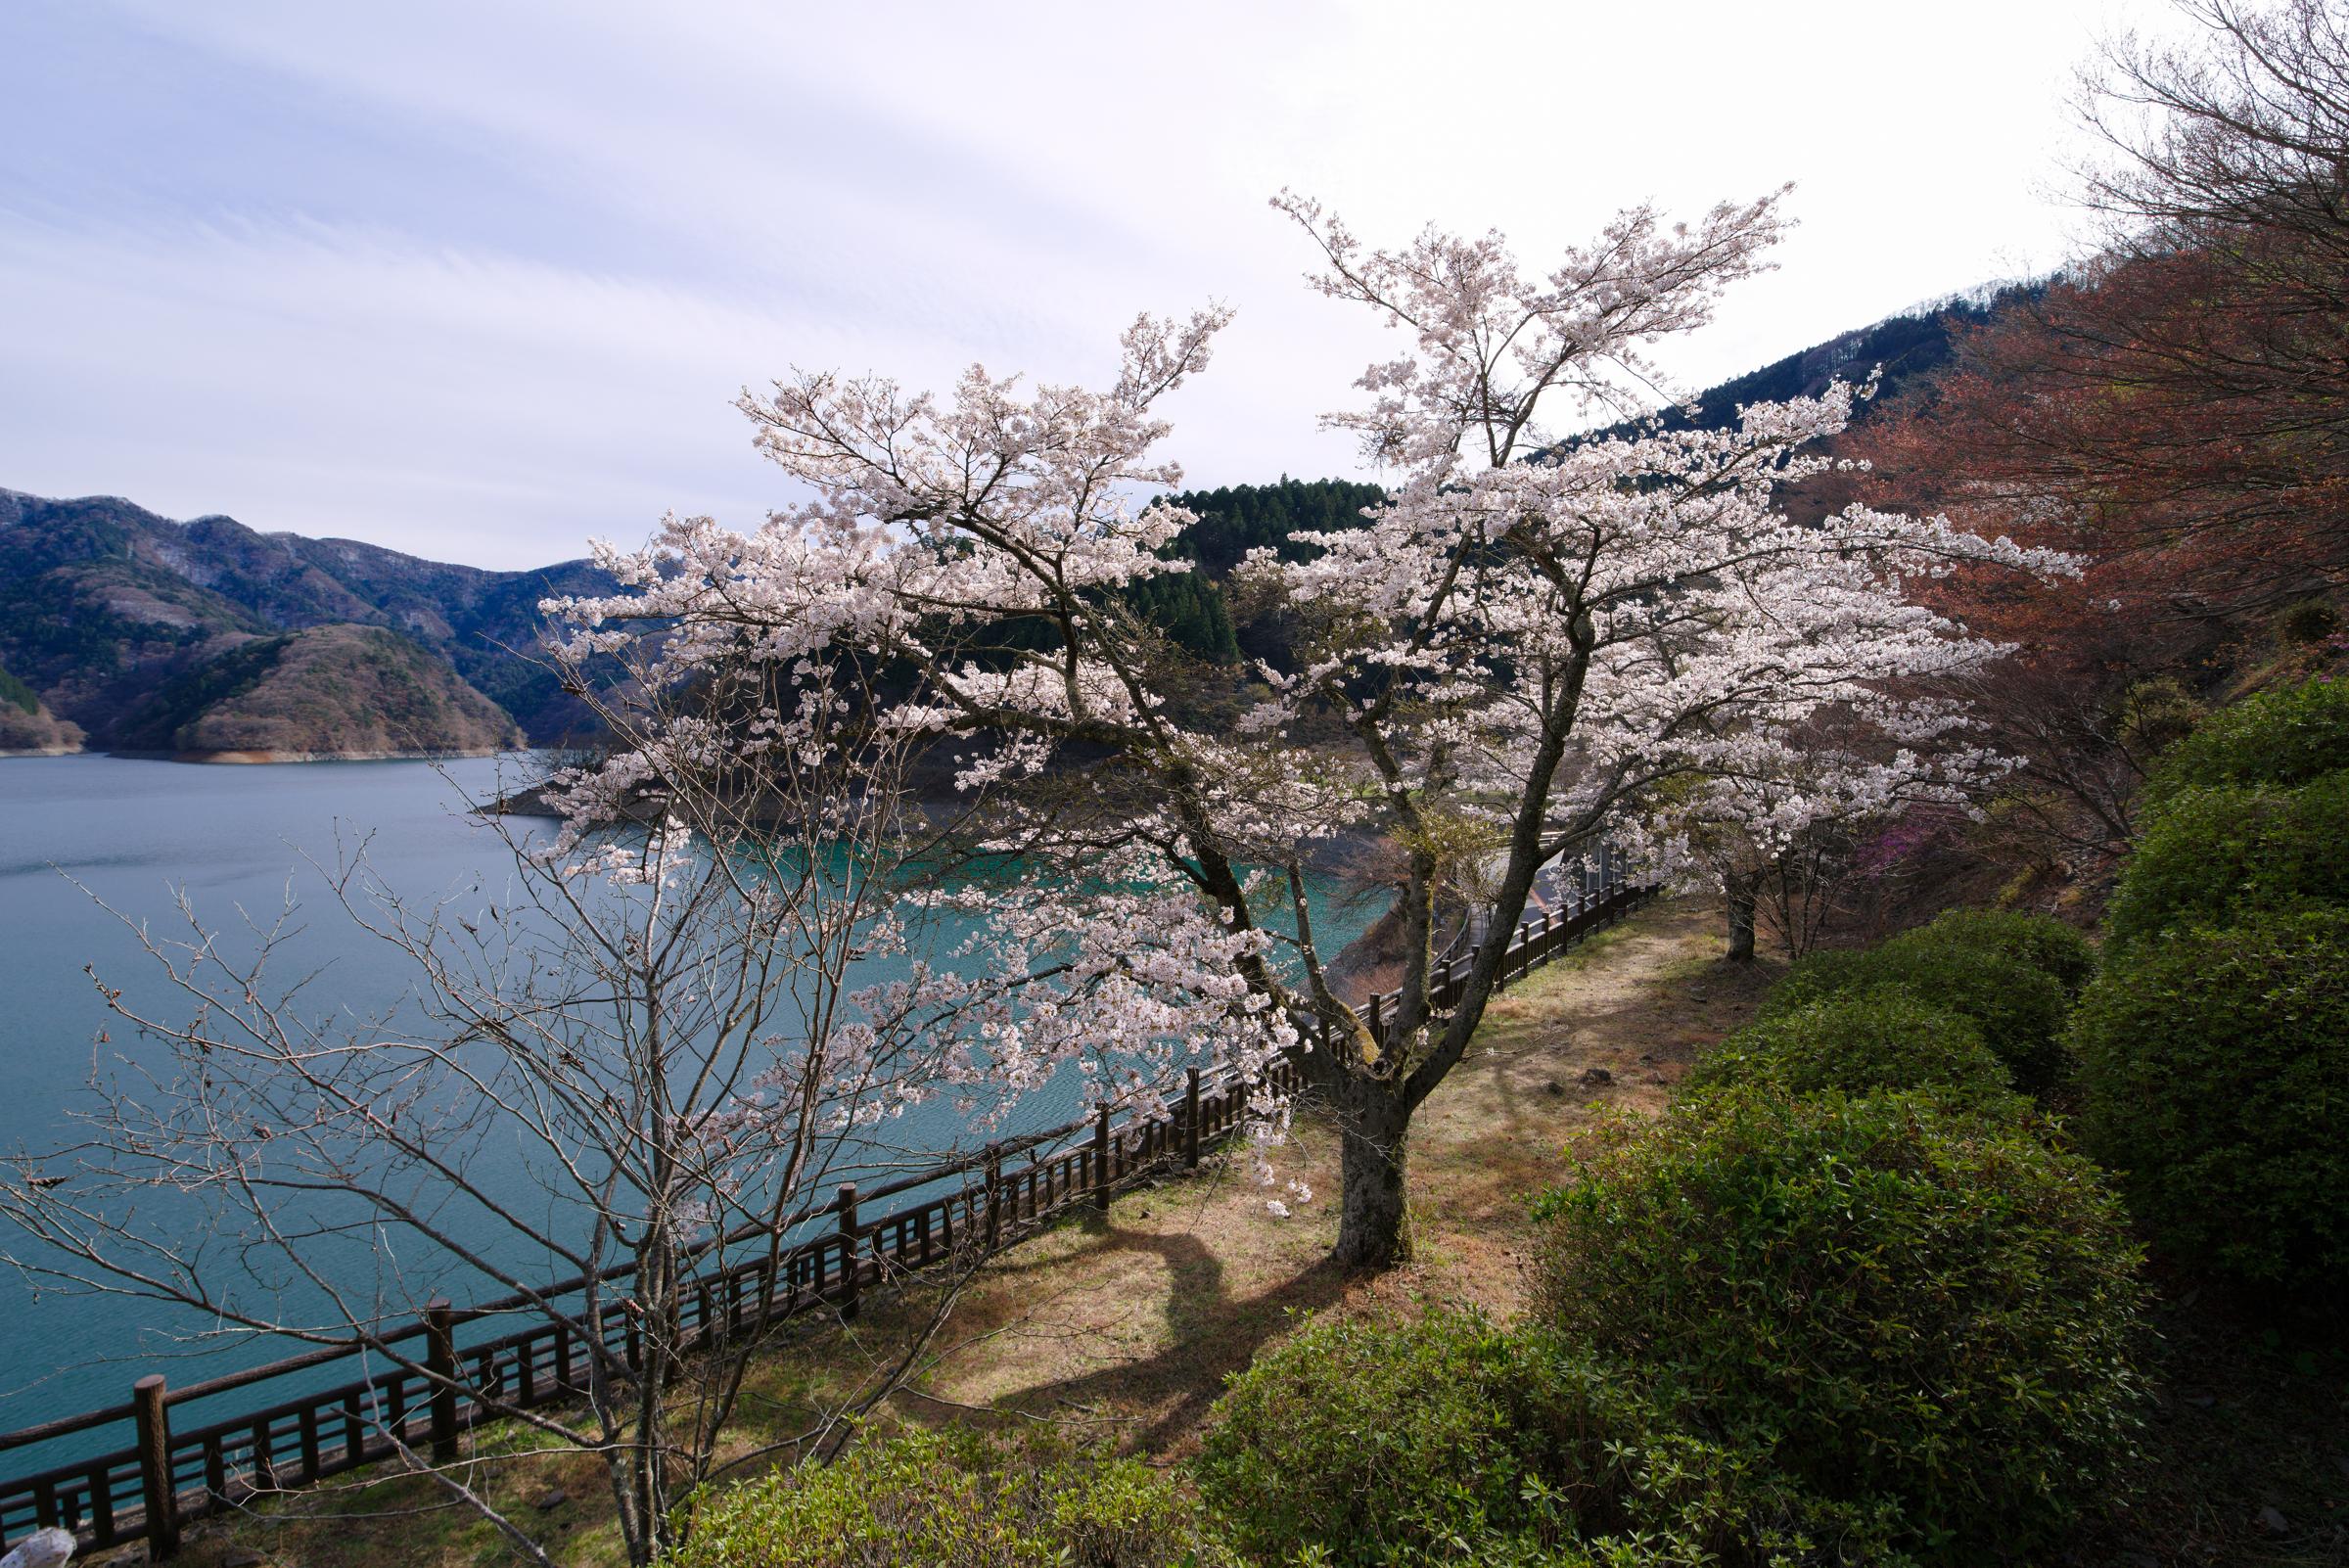 奥多摩湖の桜2019 | PENTAX K-1&D FA15-30mm